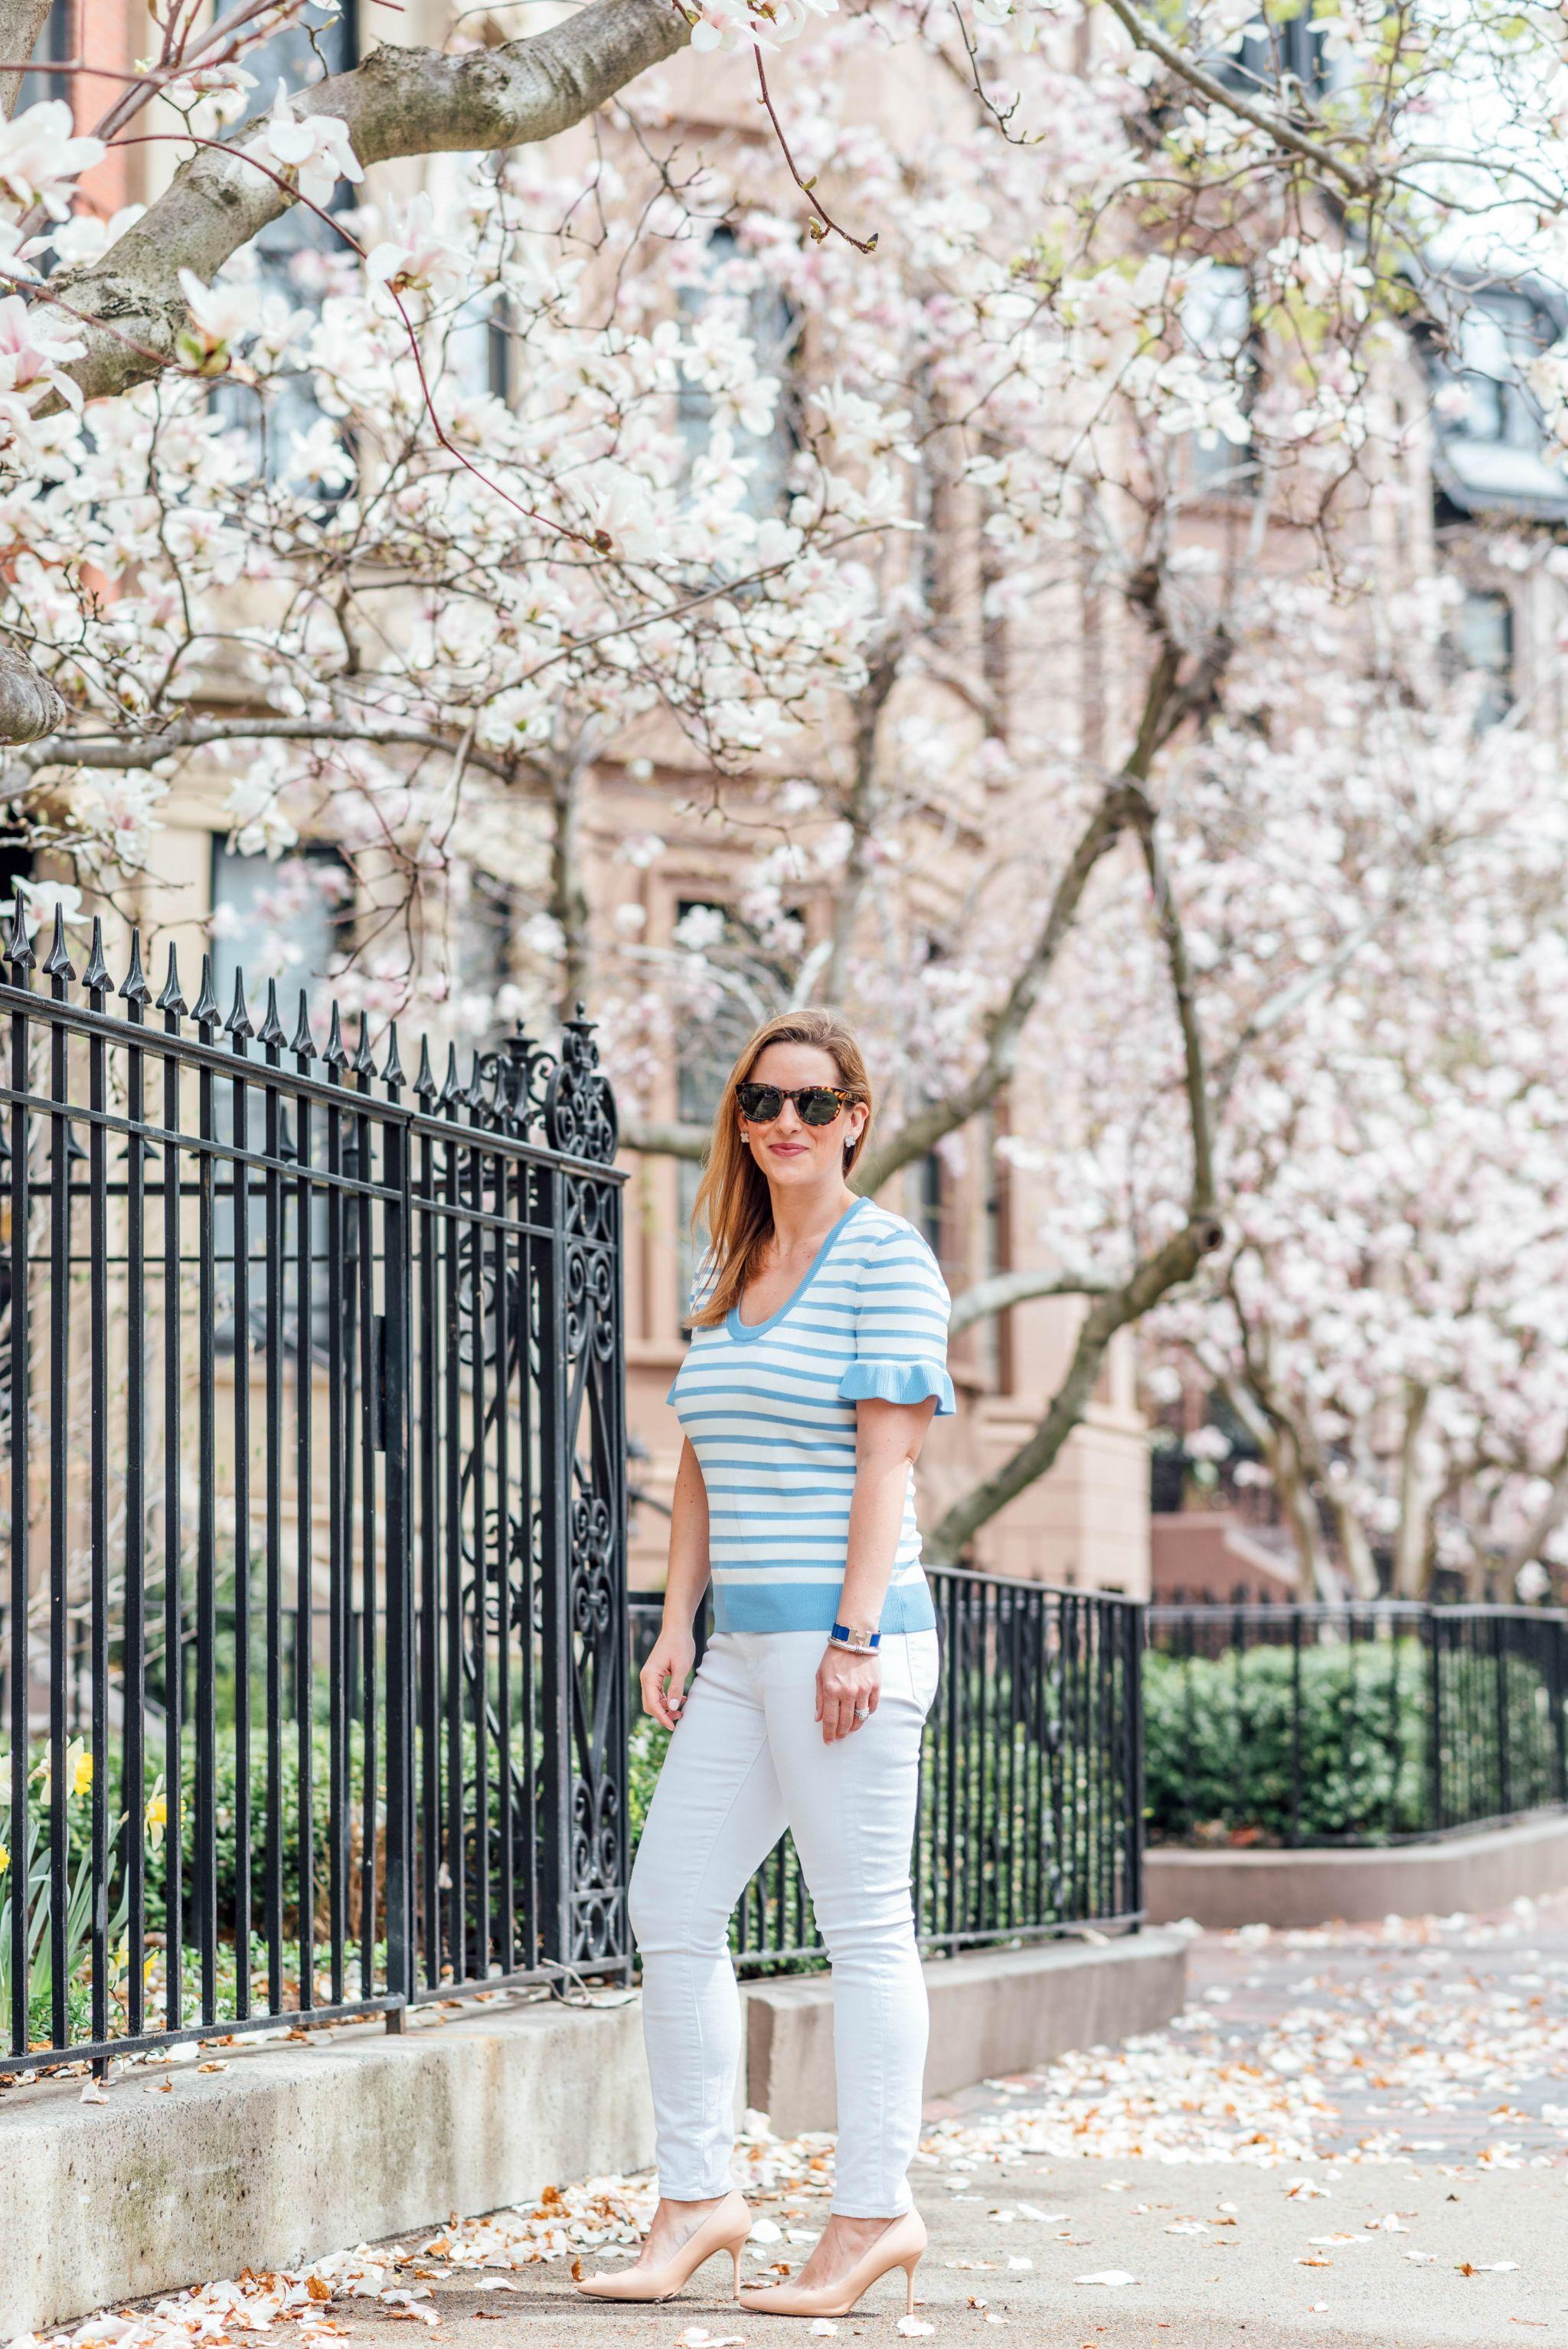 d453f1b78db Stripes, Ruffles & White Jeans - Boston Chic Party